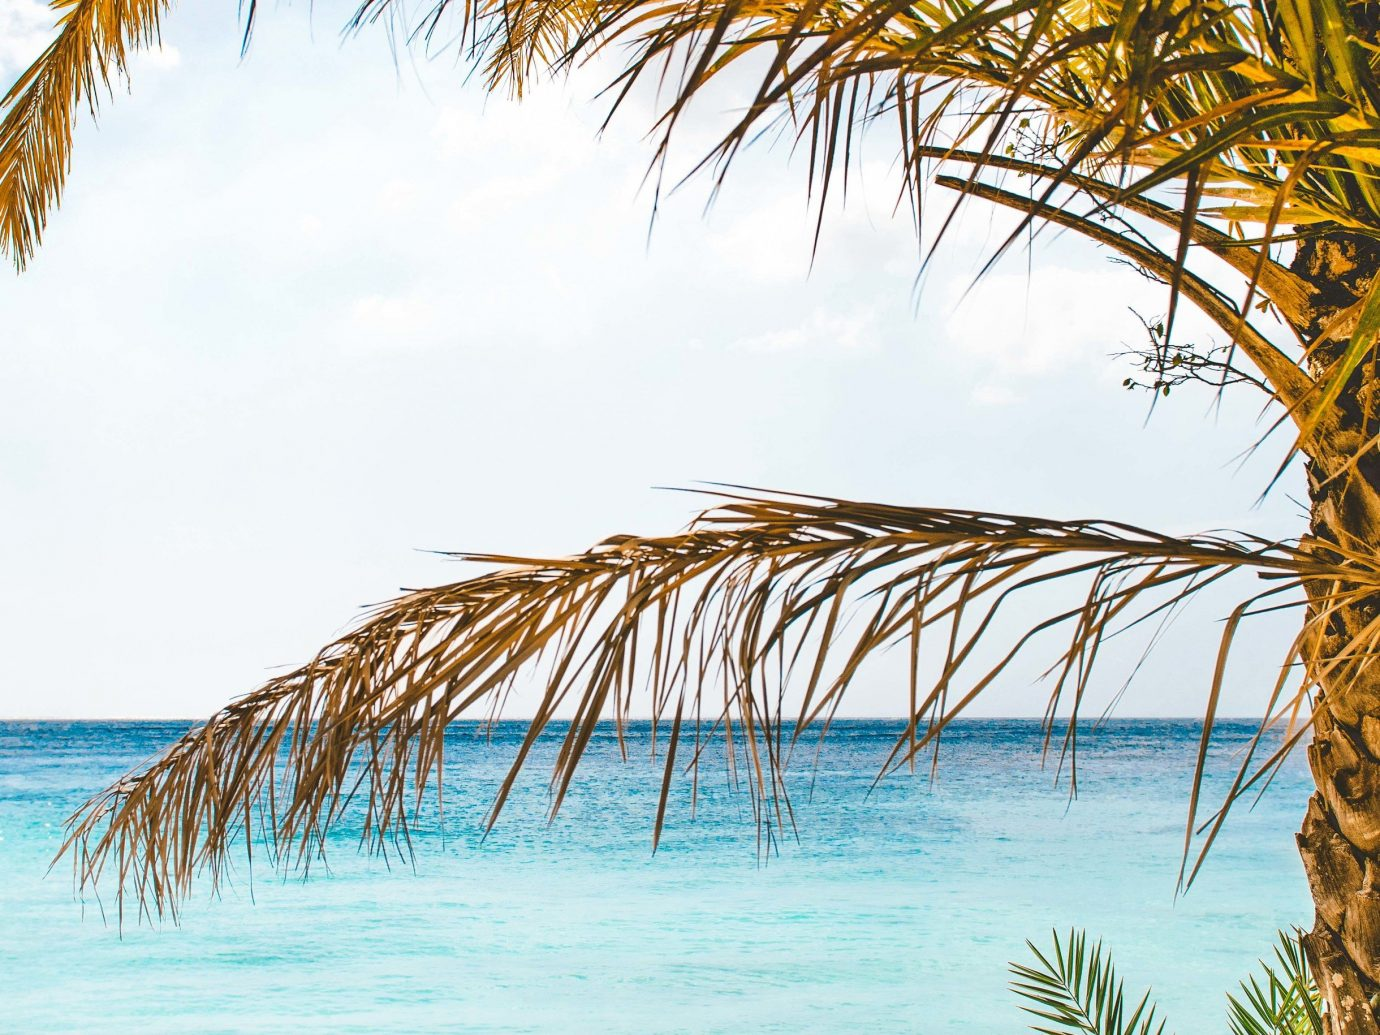 Beaches caribbean Sea tropics vacation tree palm tree sky arecales shore Beach Ocean Coast water tourism computer wallpaper